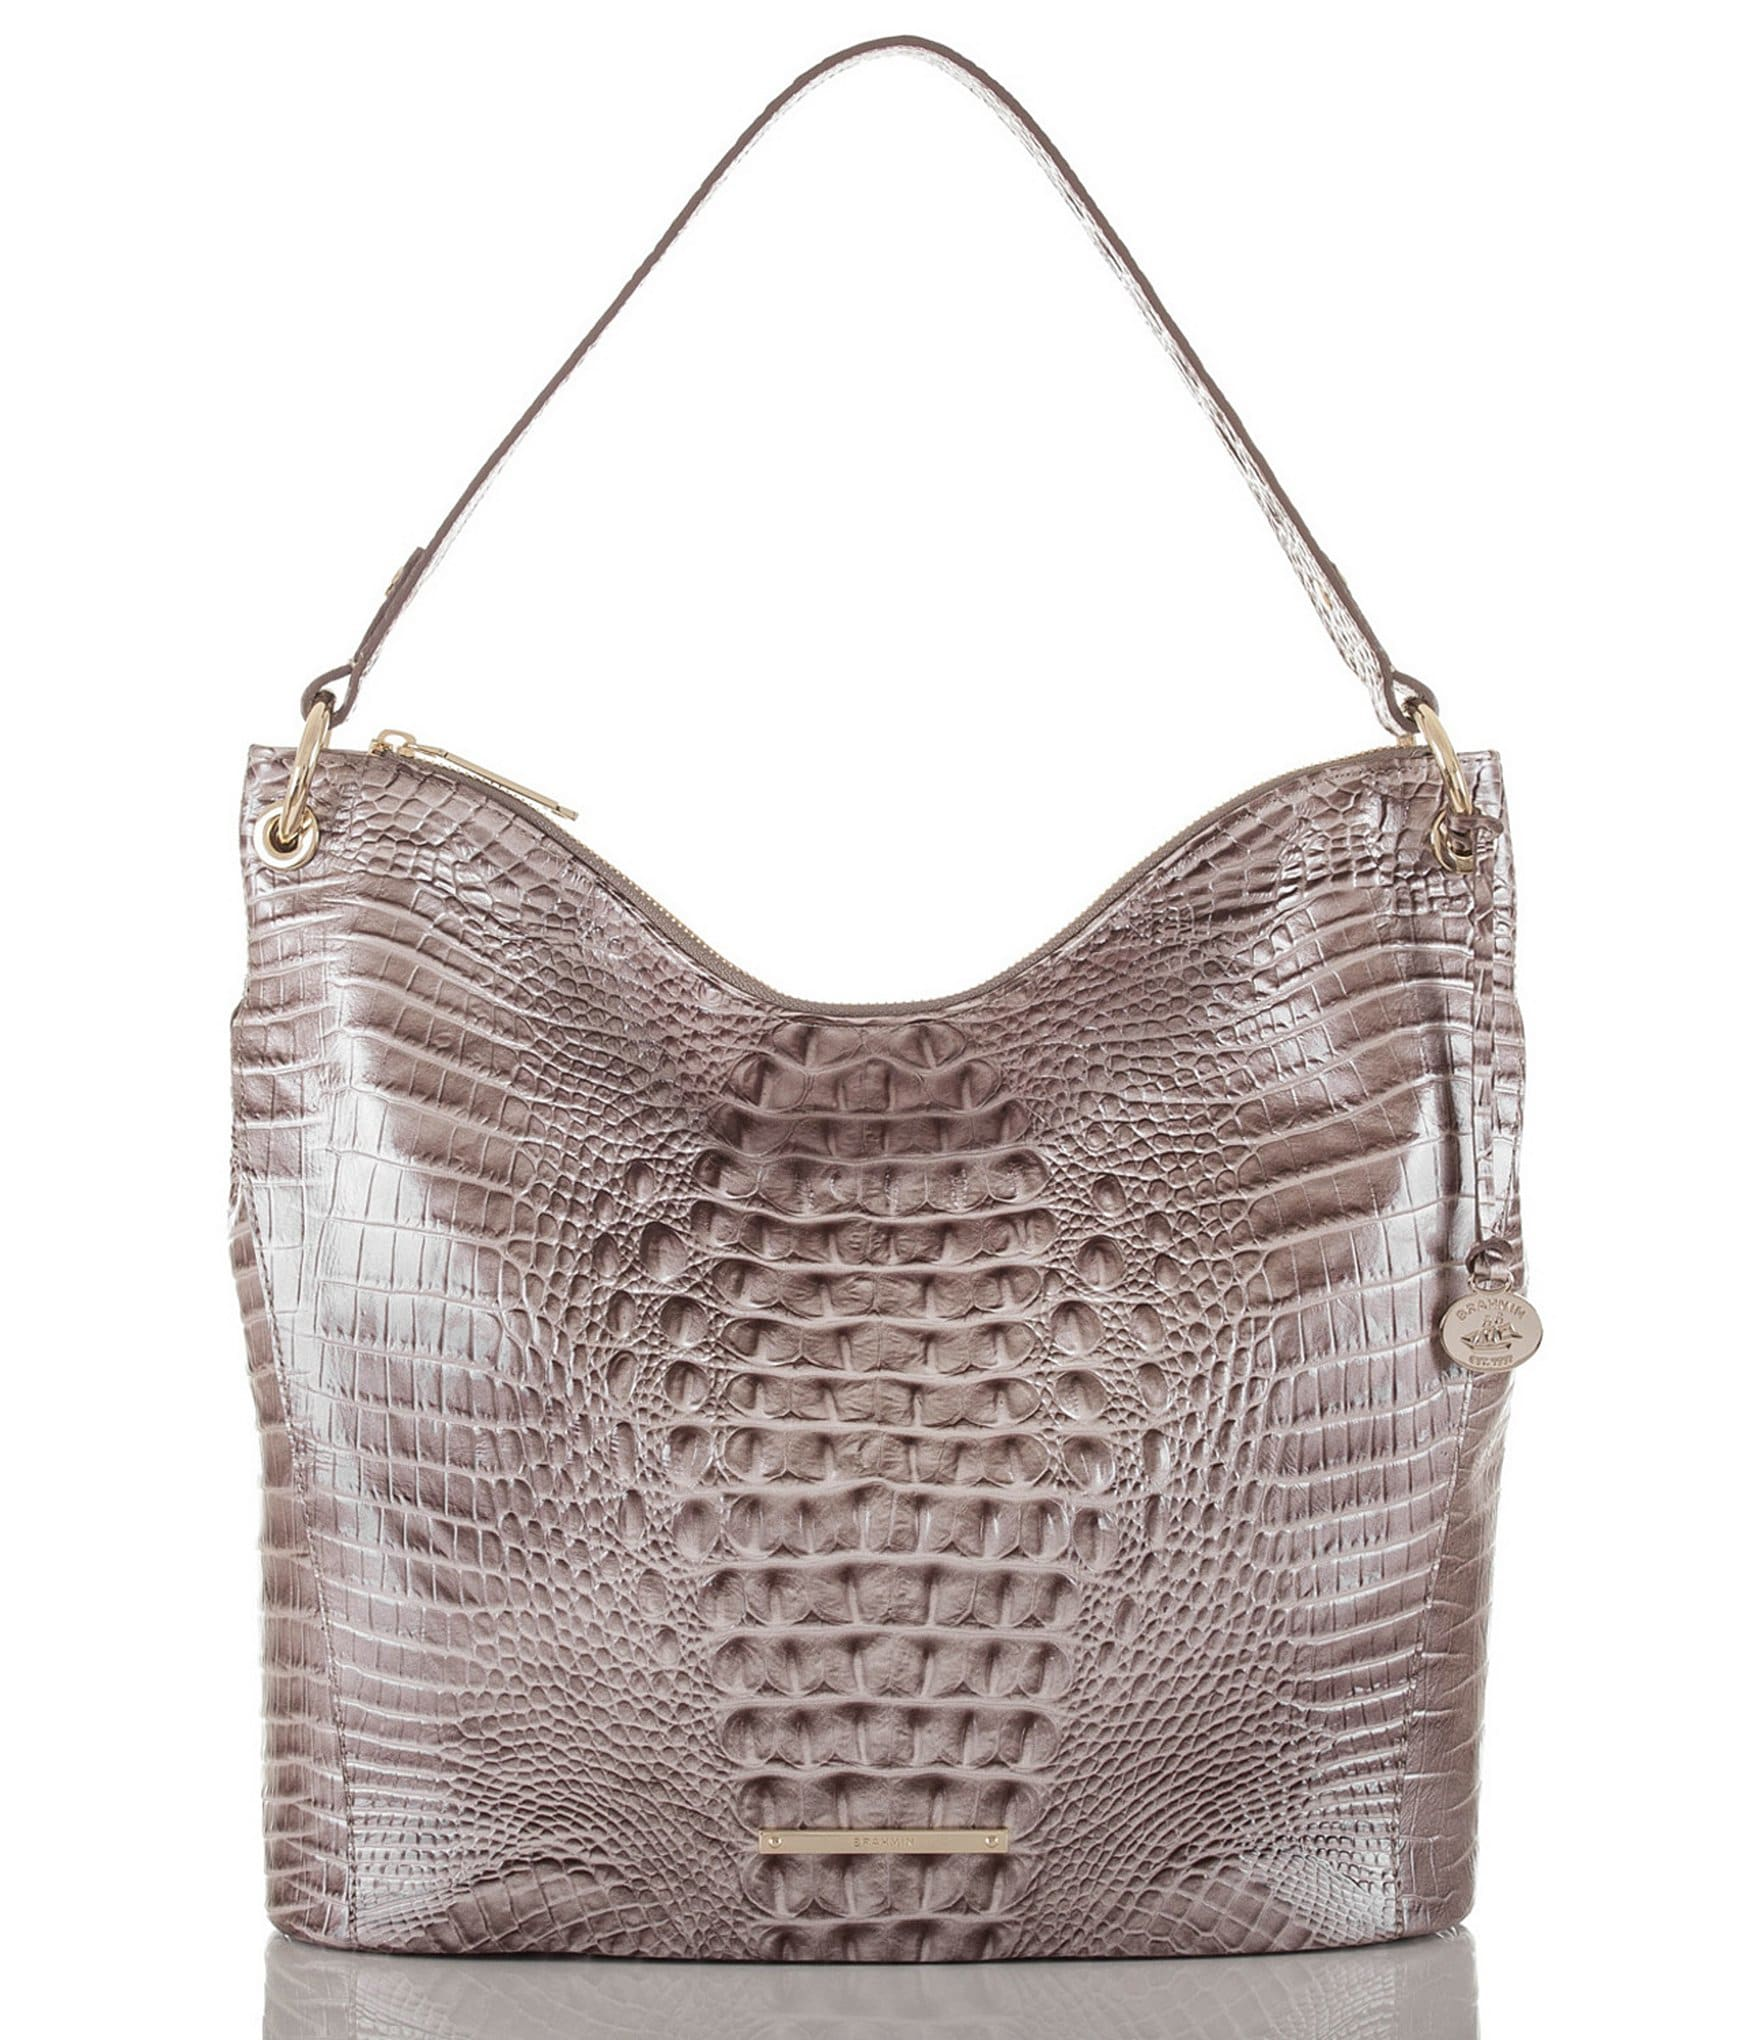 bb9ba933853424 Dillard's Brahmin Sale Handbags Clearance | Stanford Center for ...